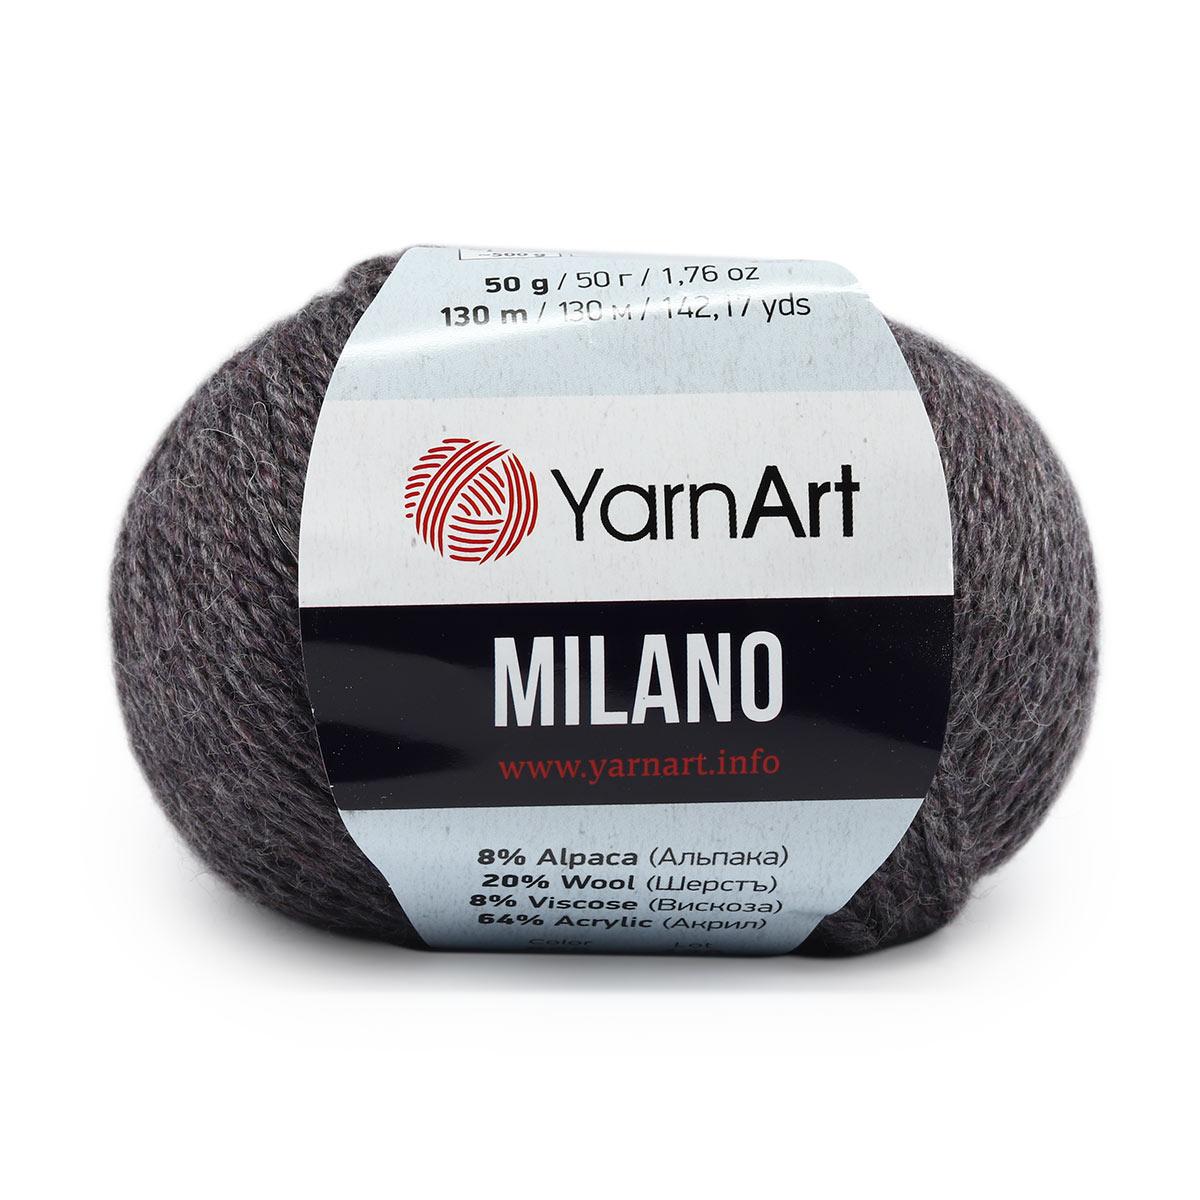 Пряжа YarnArt 'Milano' 50гр 130м (8% альпака, 20% шерсть, 8% вискоза, 64% акрил)